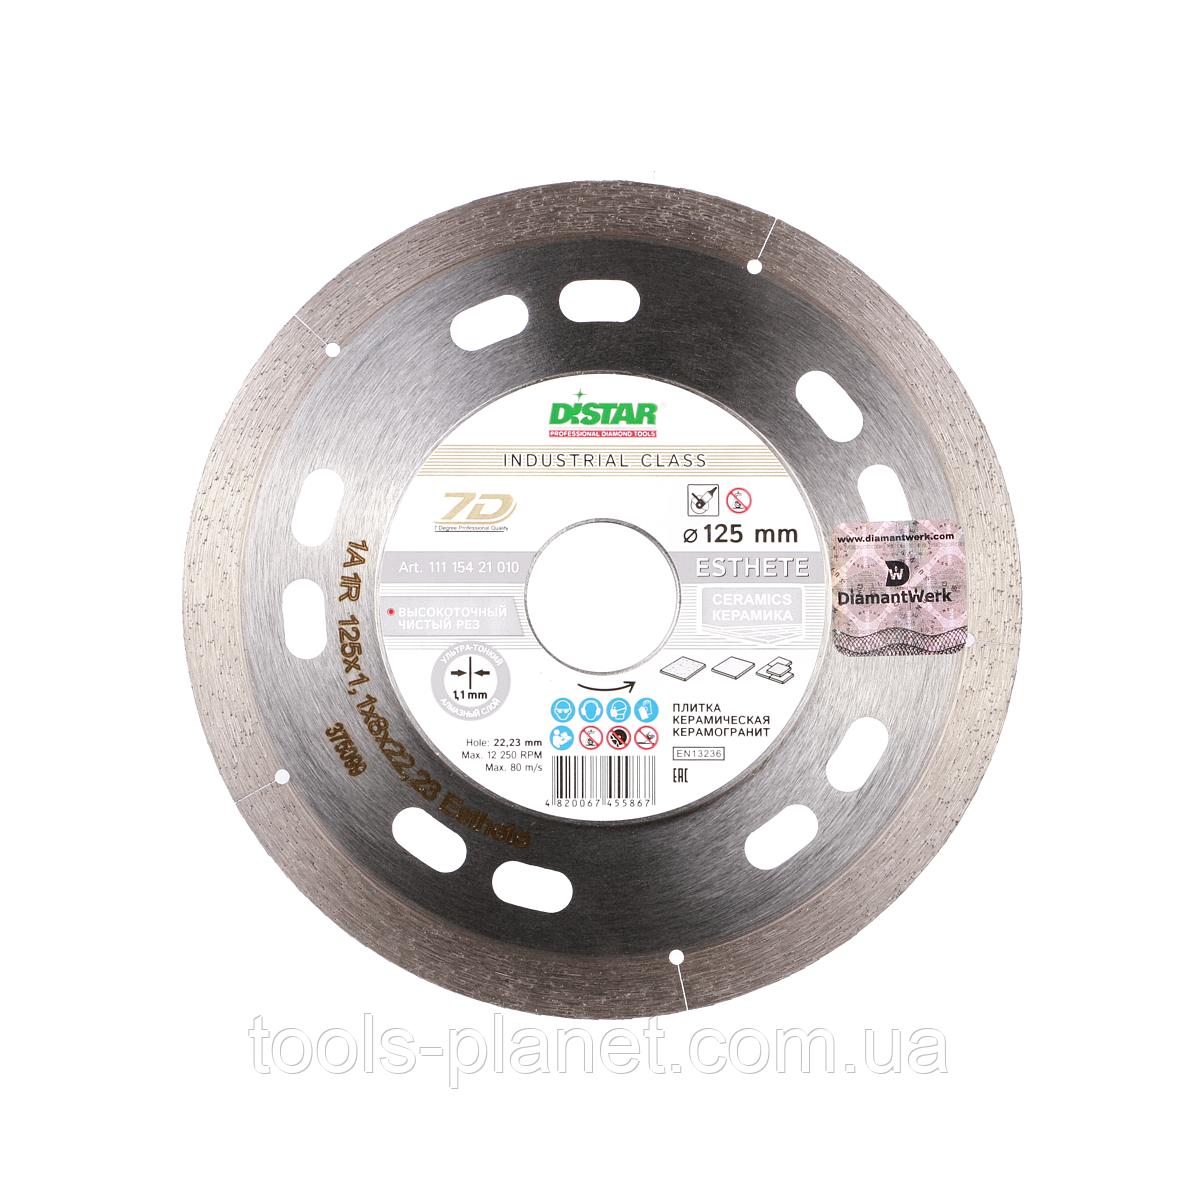 Алмазний диск Distar 1A1R 115 x 1,1 x 8 x 22,23 Esthete 7D (11115421009)